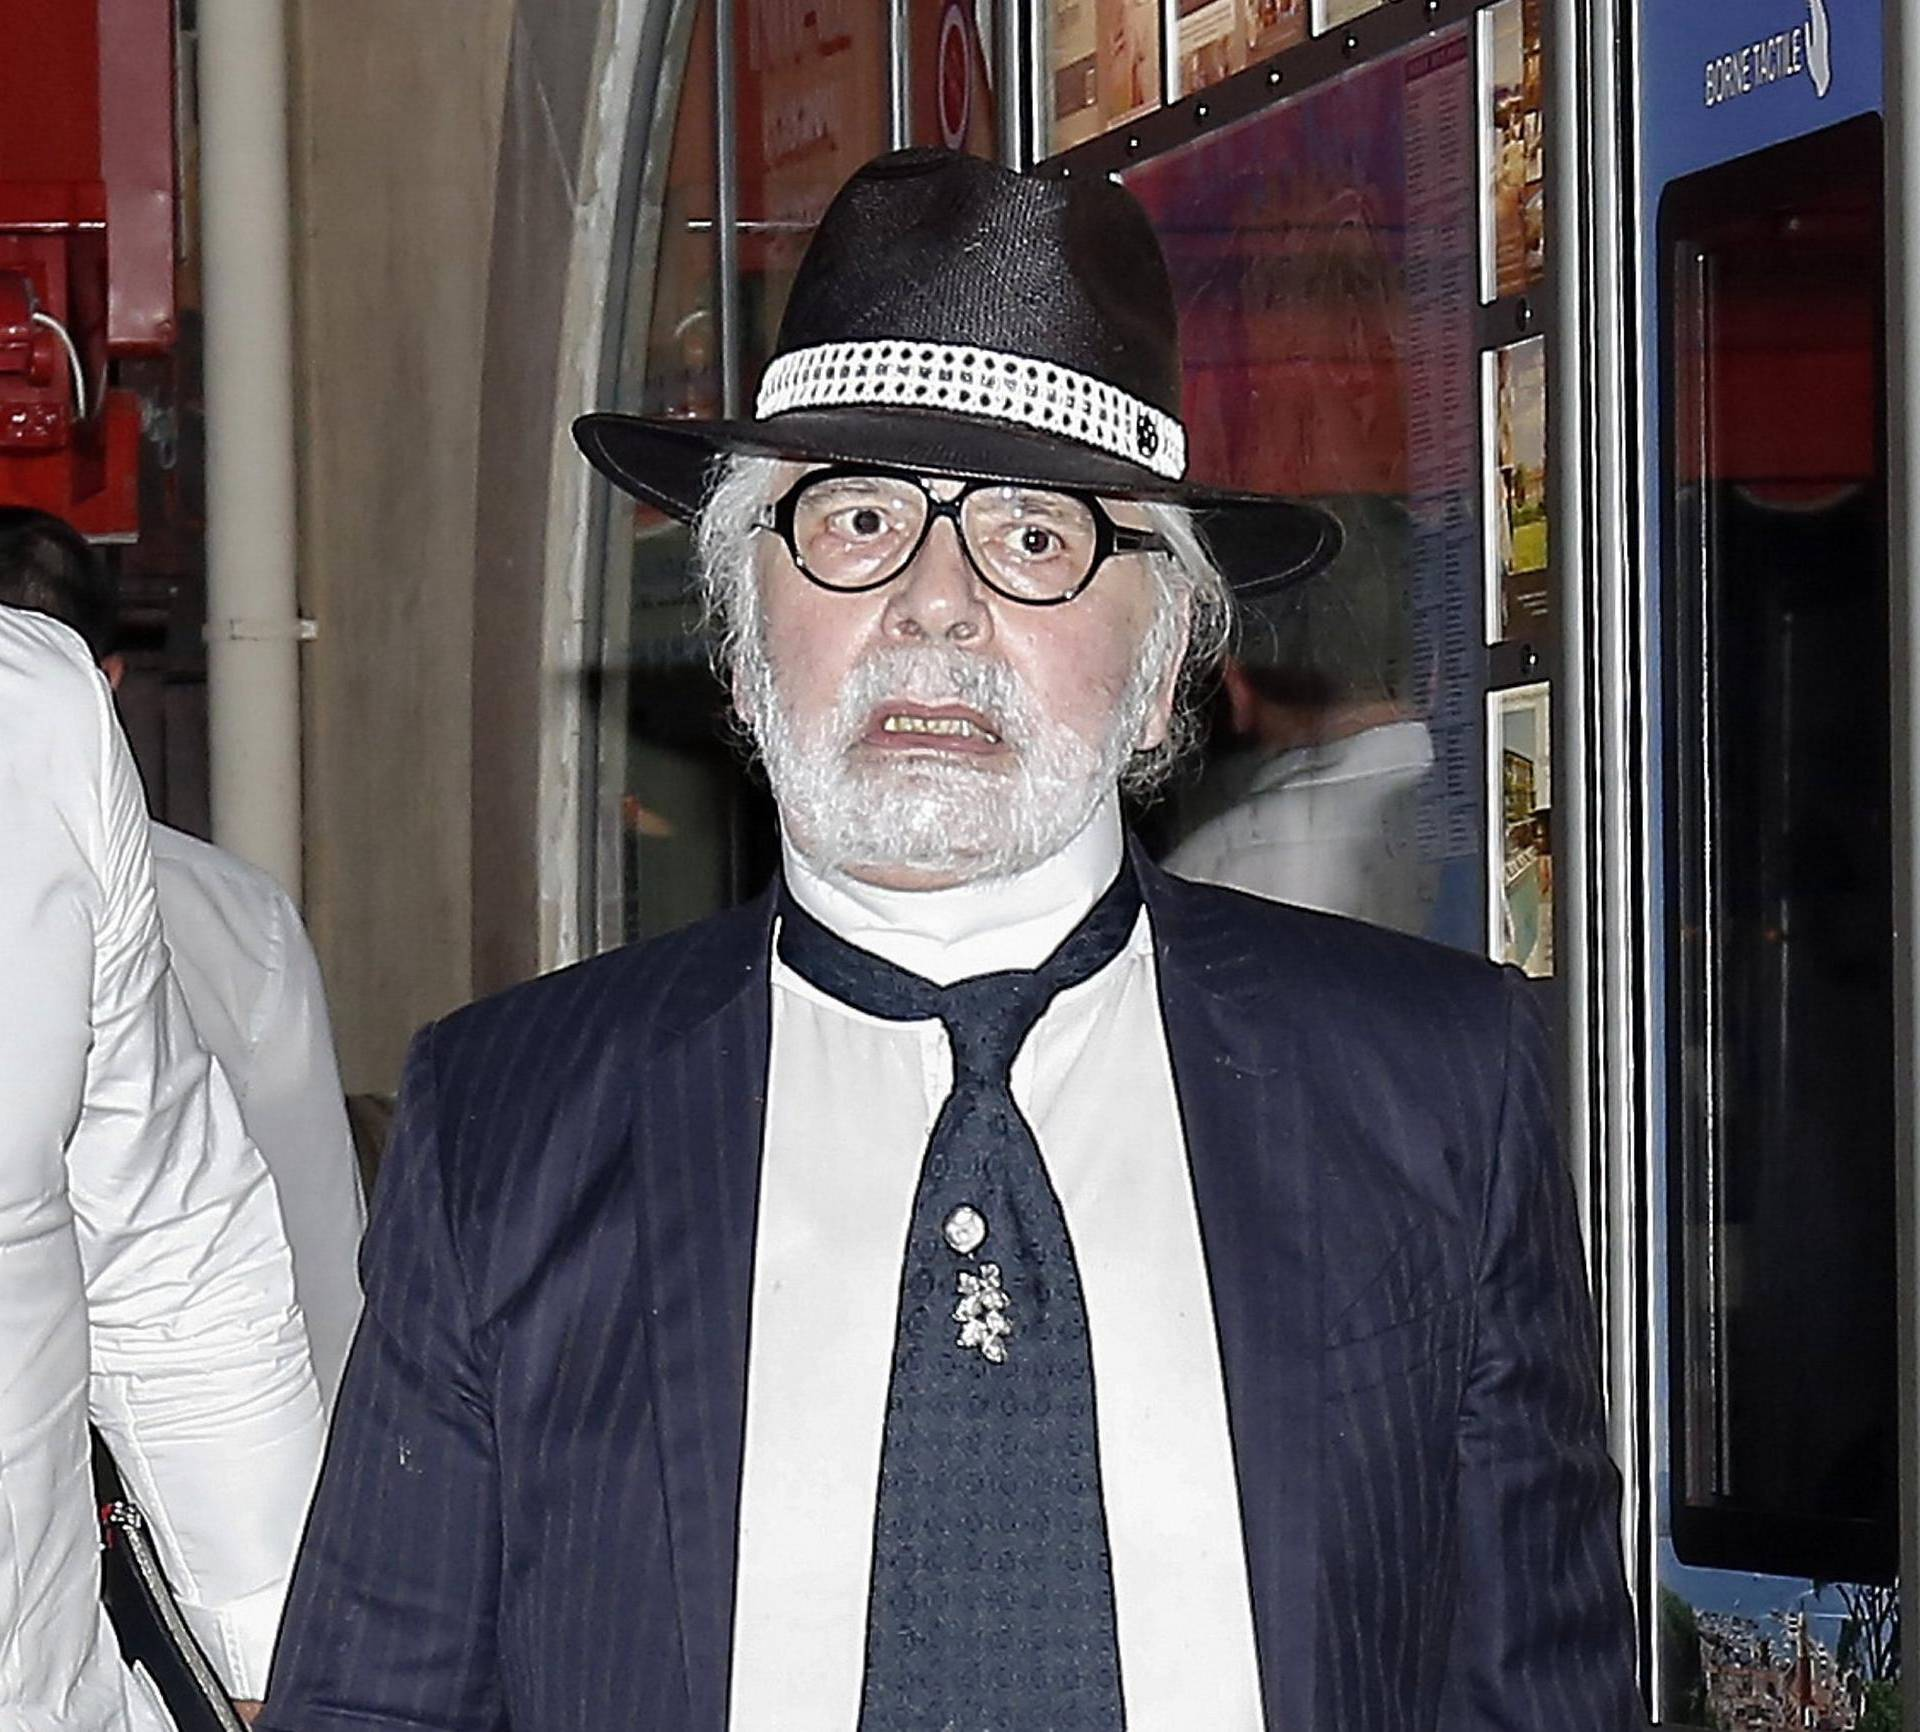 Karl Lagerfeld leaving Le Senequier in Saint Tropez